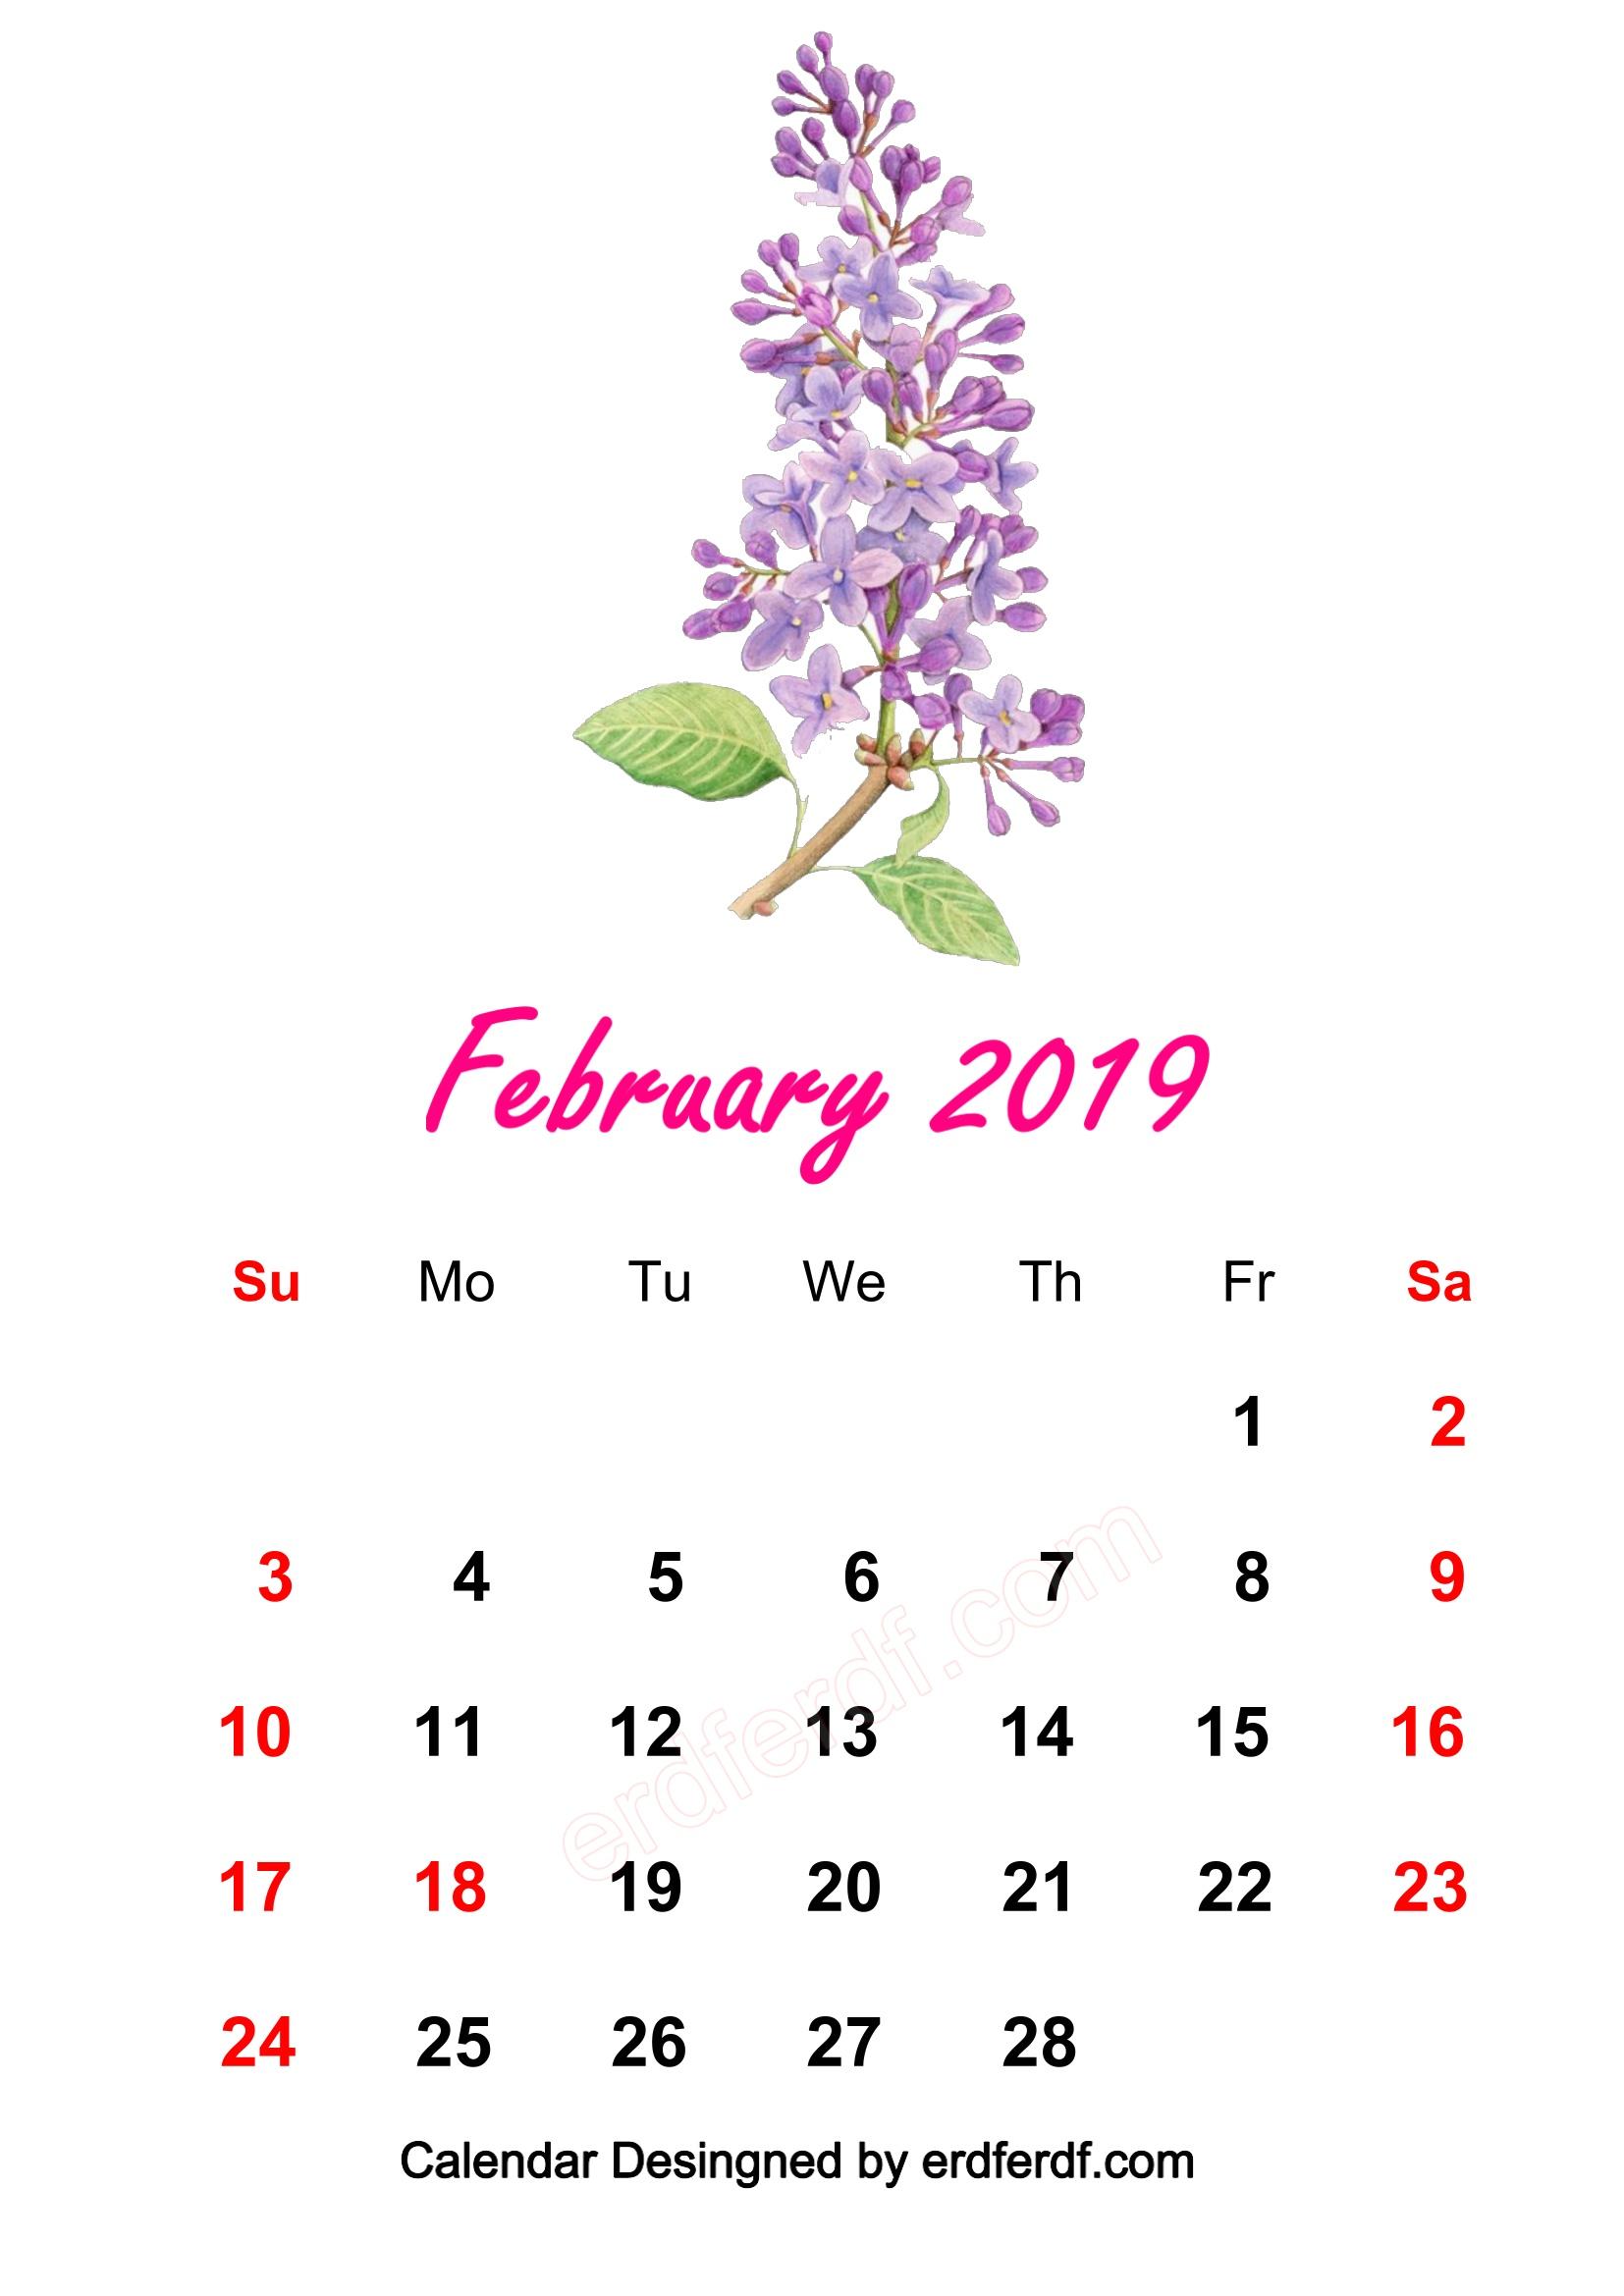 7 February 2019 HD Calendar Wallpapers Prety WaterColor